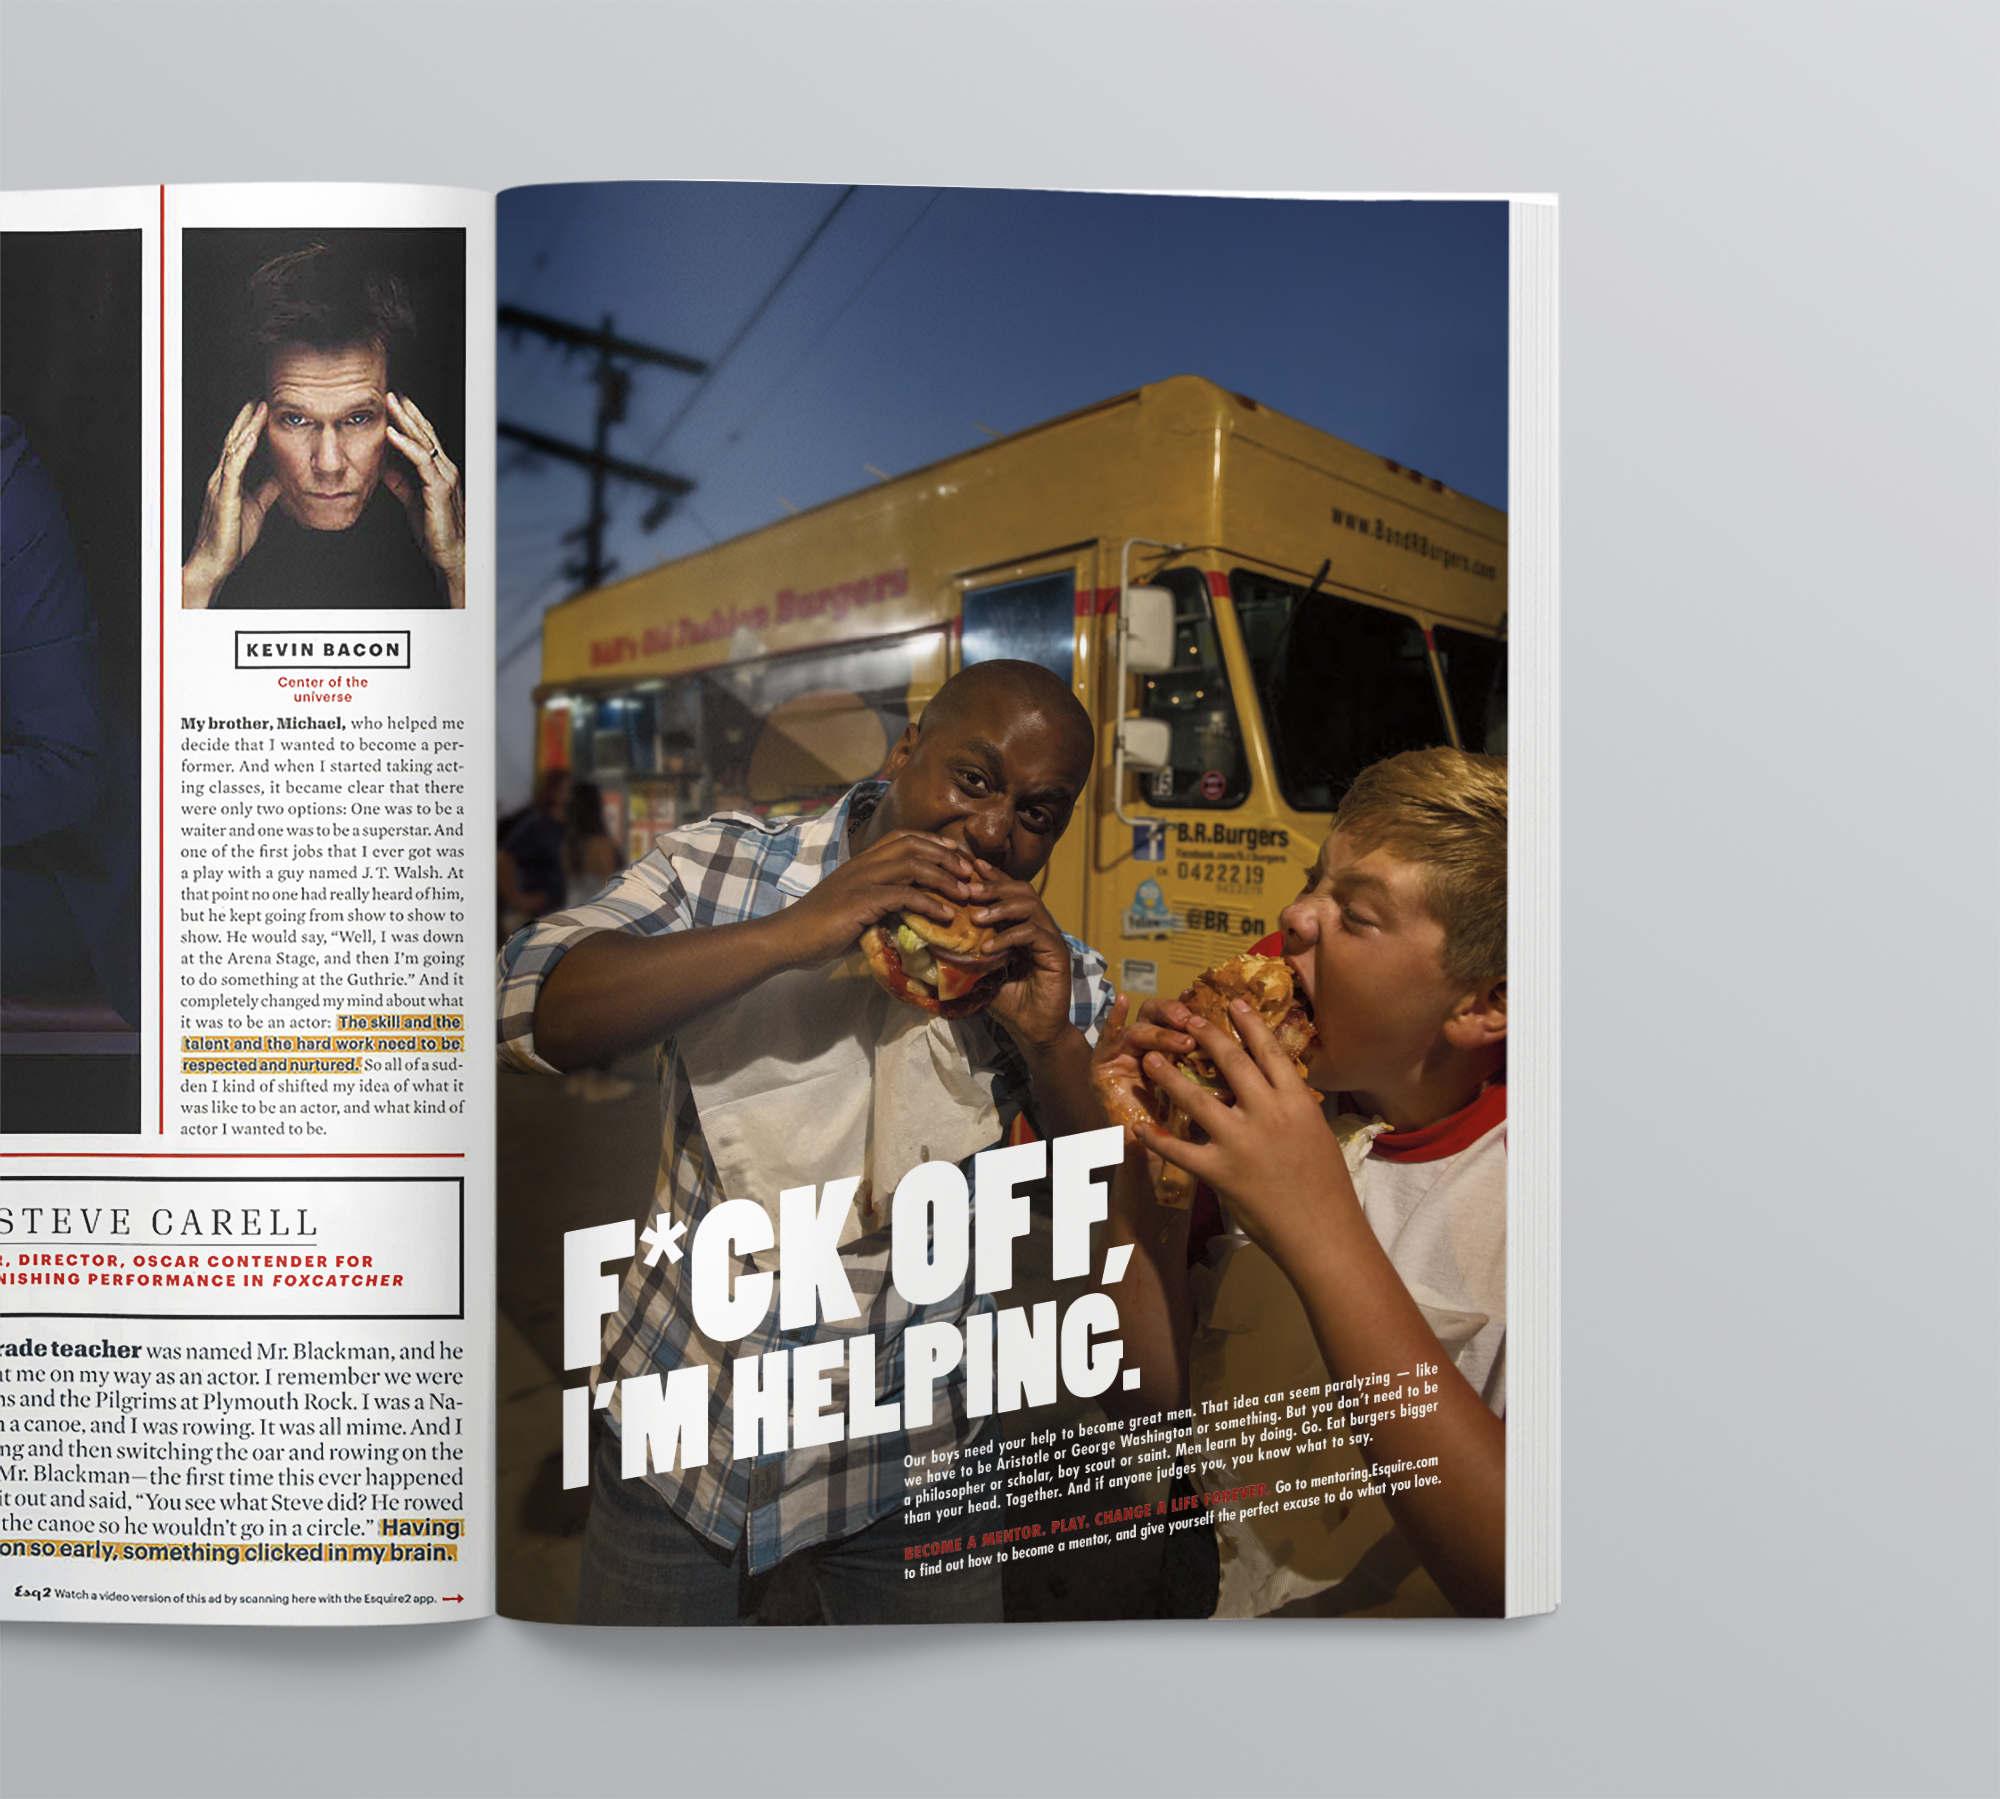 Esquire_FuckOff_Ads_2000px_Burger_2000_c.jpg